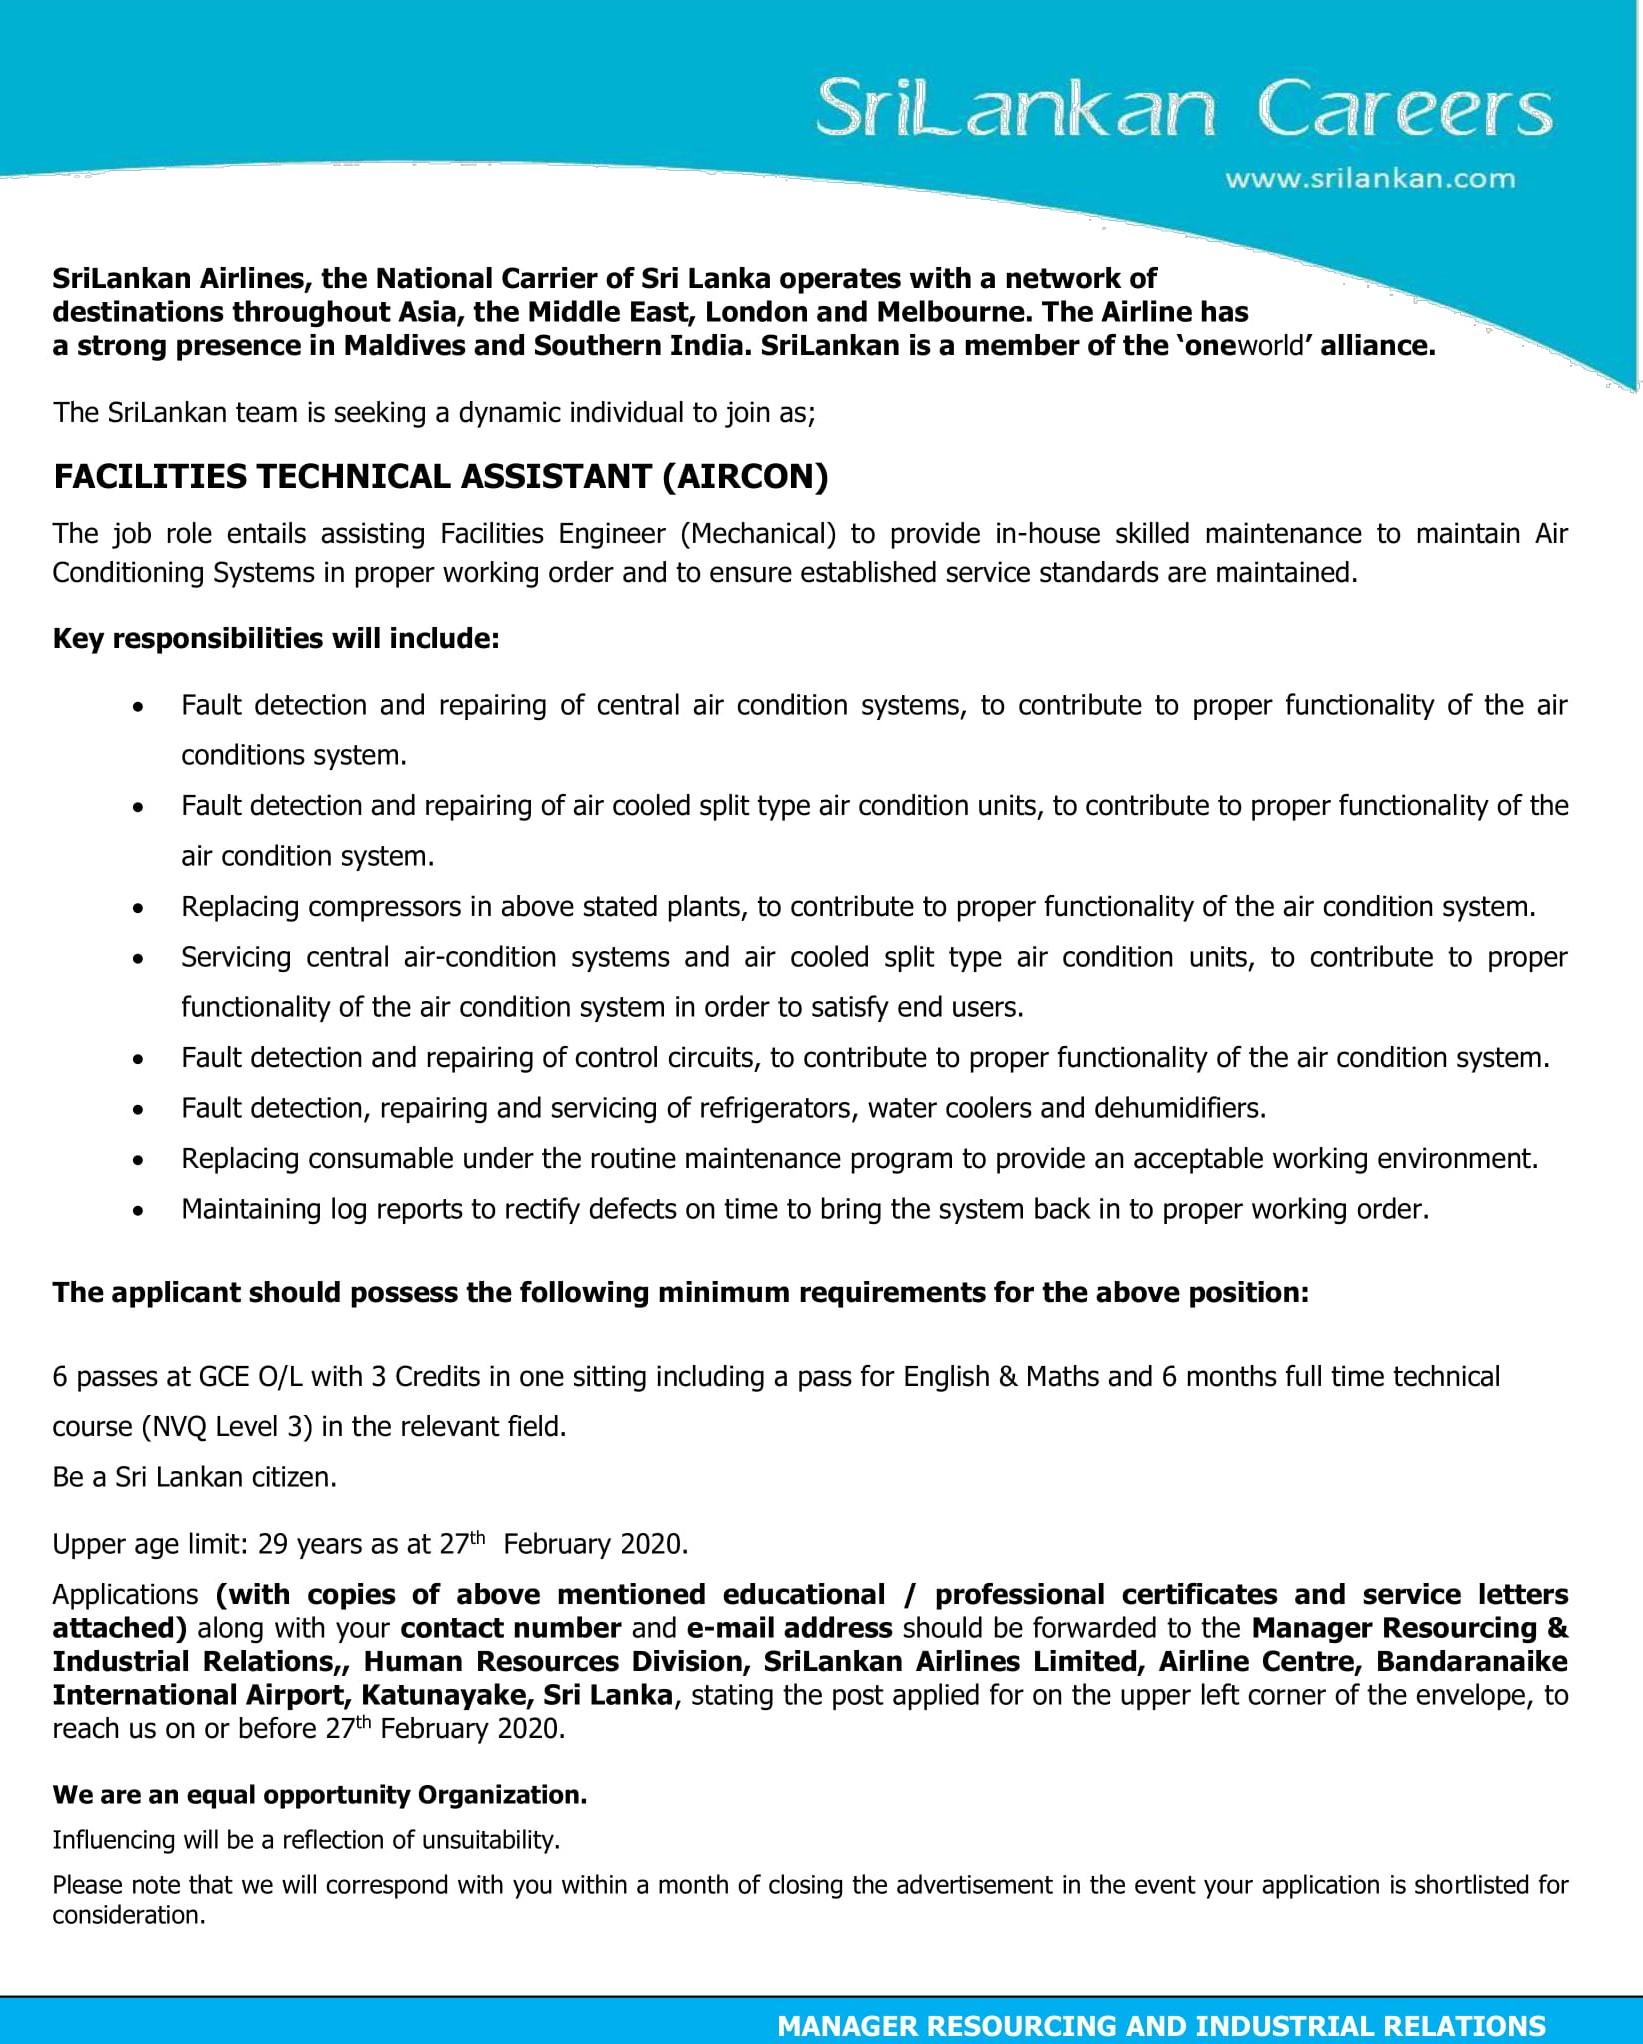 Facilities Technical Assistant (Generator, Aircon) - Sri Lankan Airlines Ltd